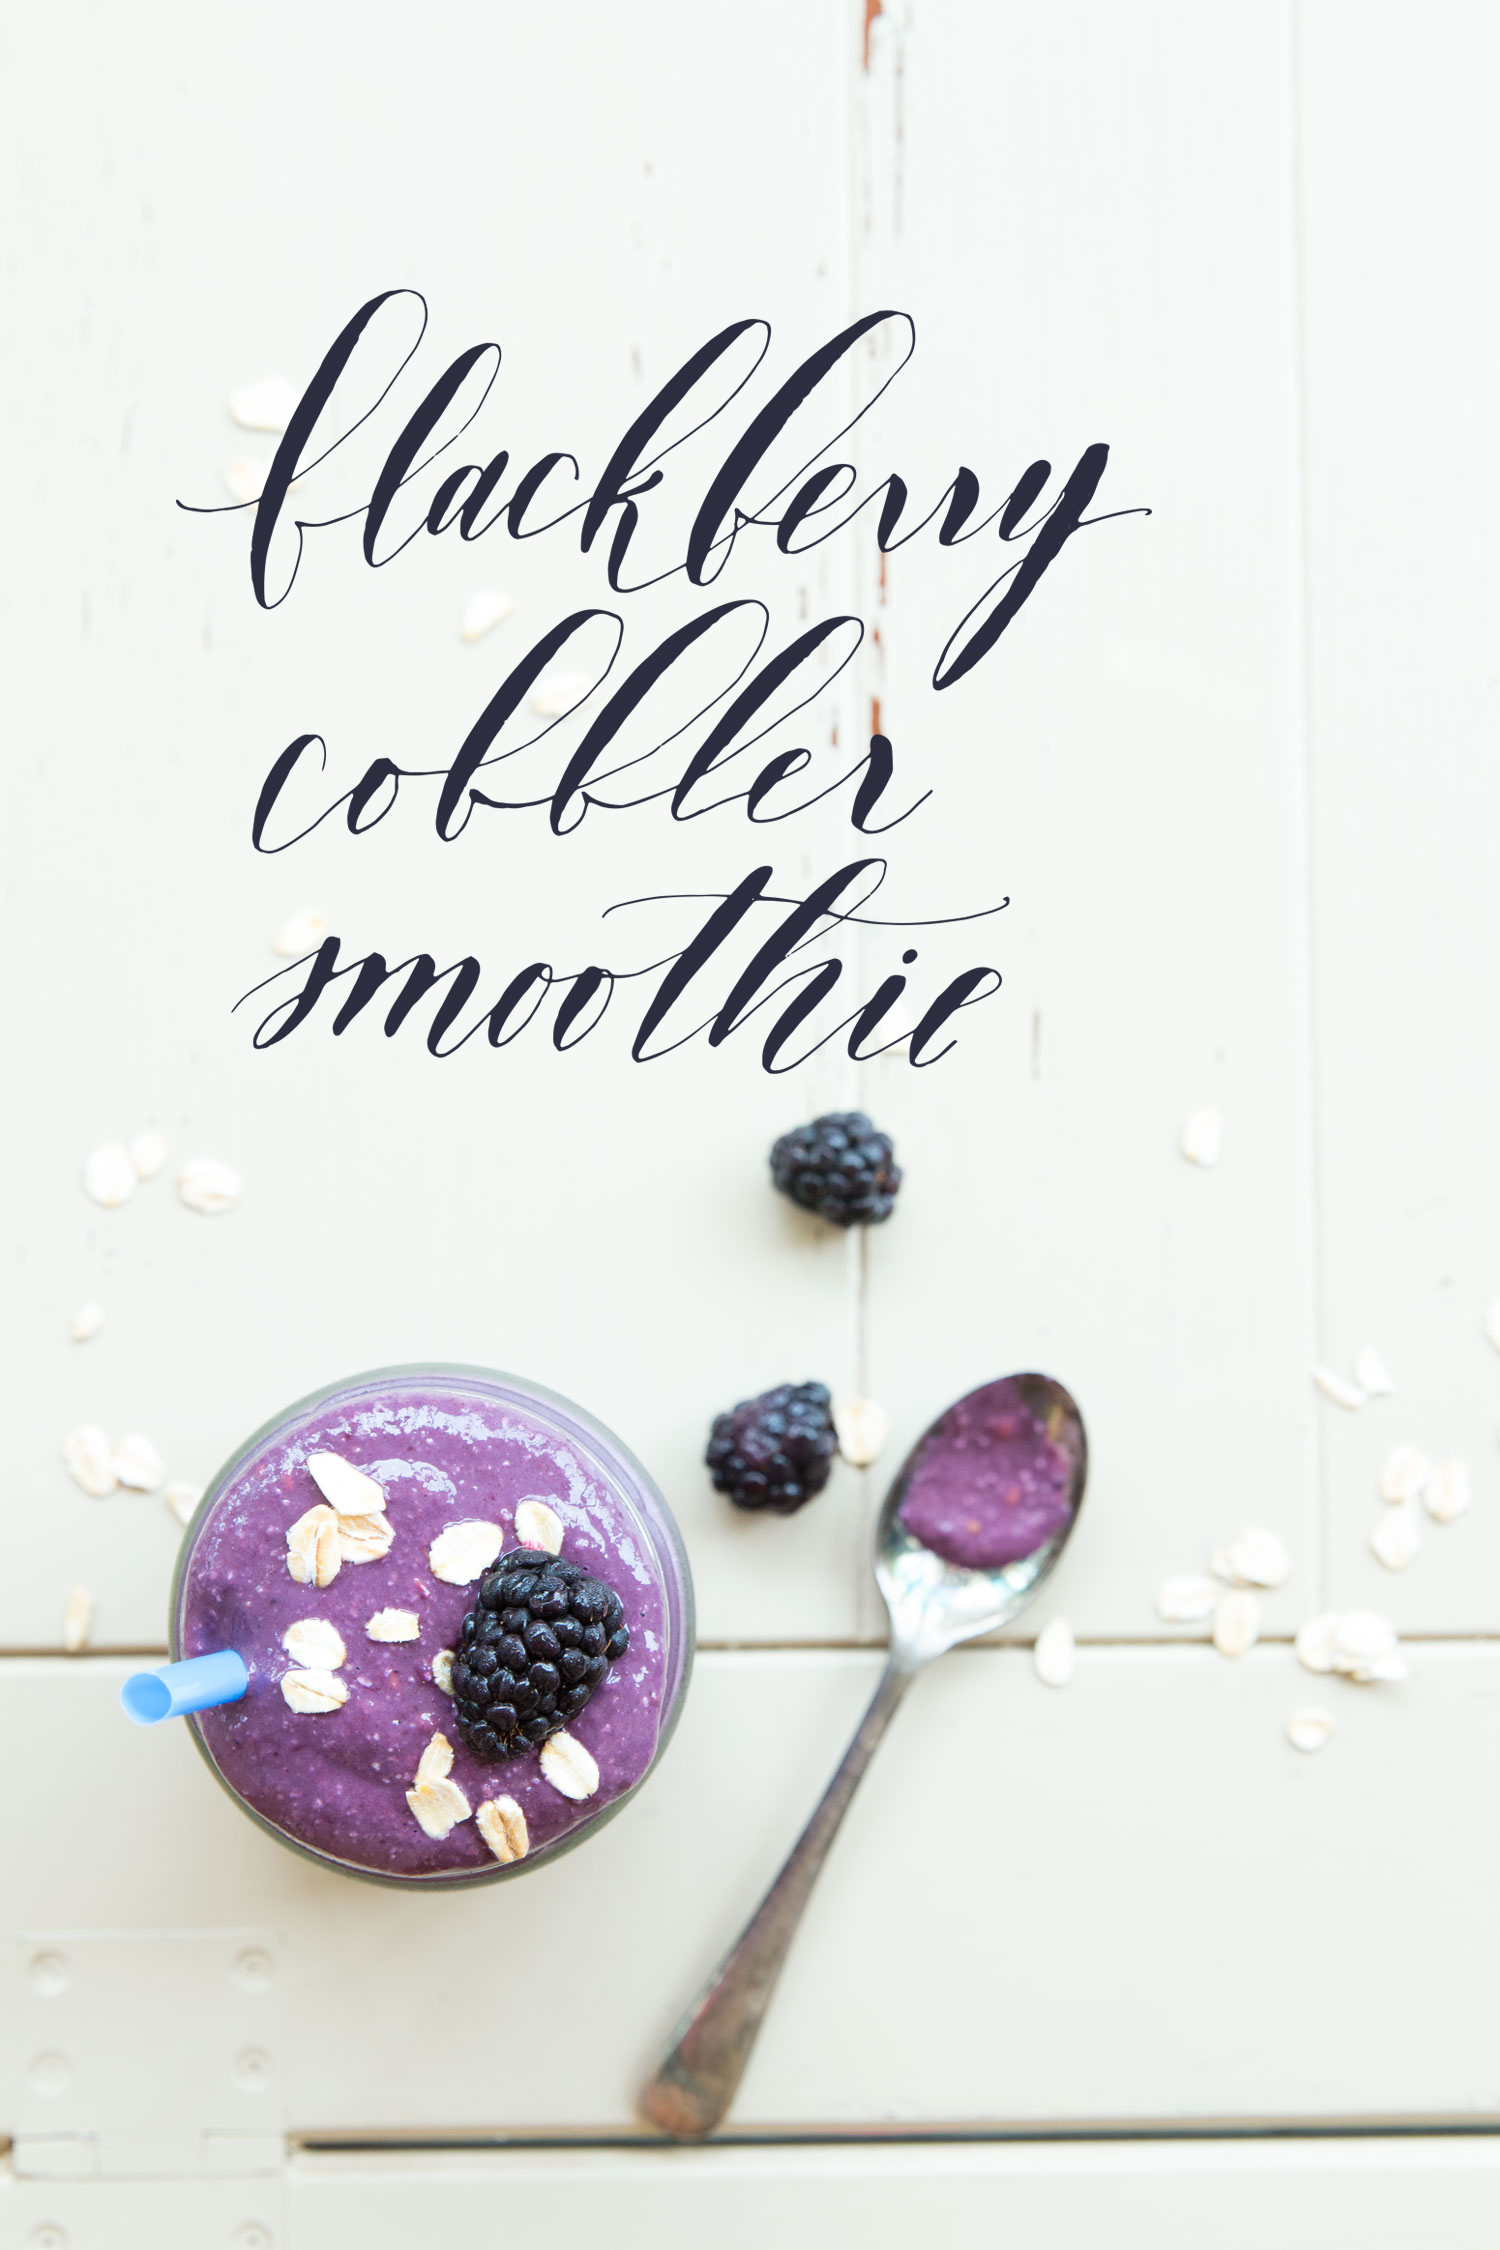 blackberry-cobbler-smoothis-coloregrace-weekofplenty1